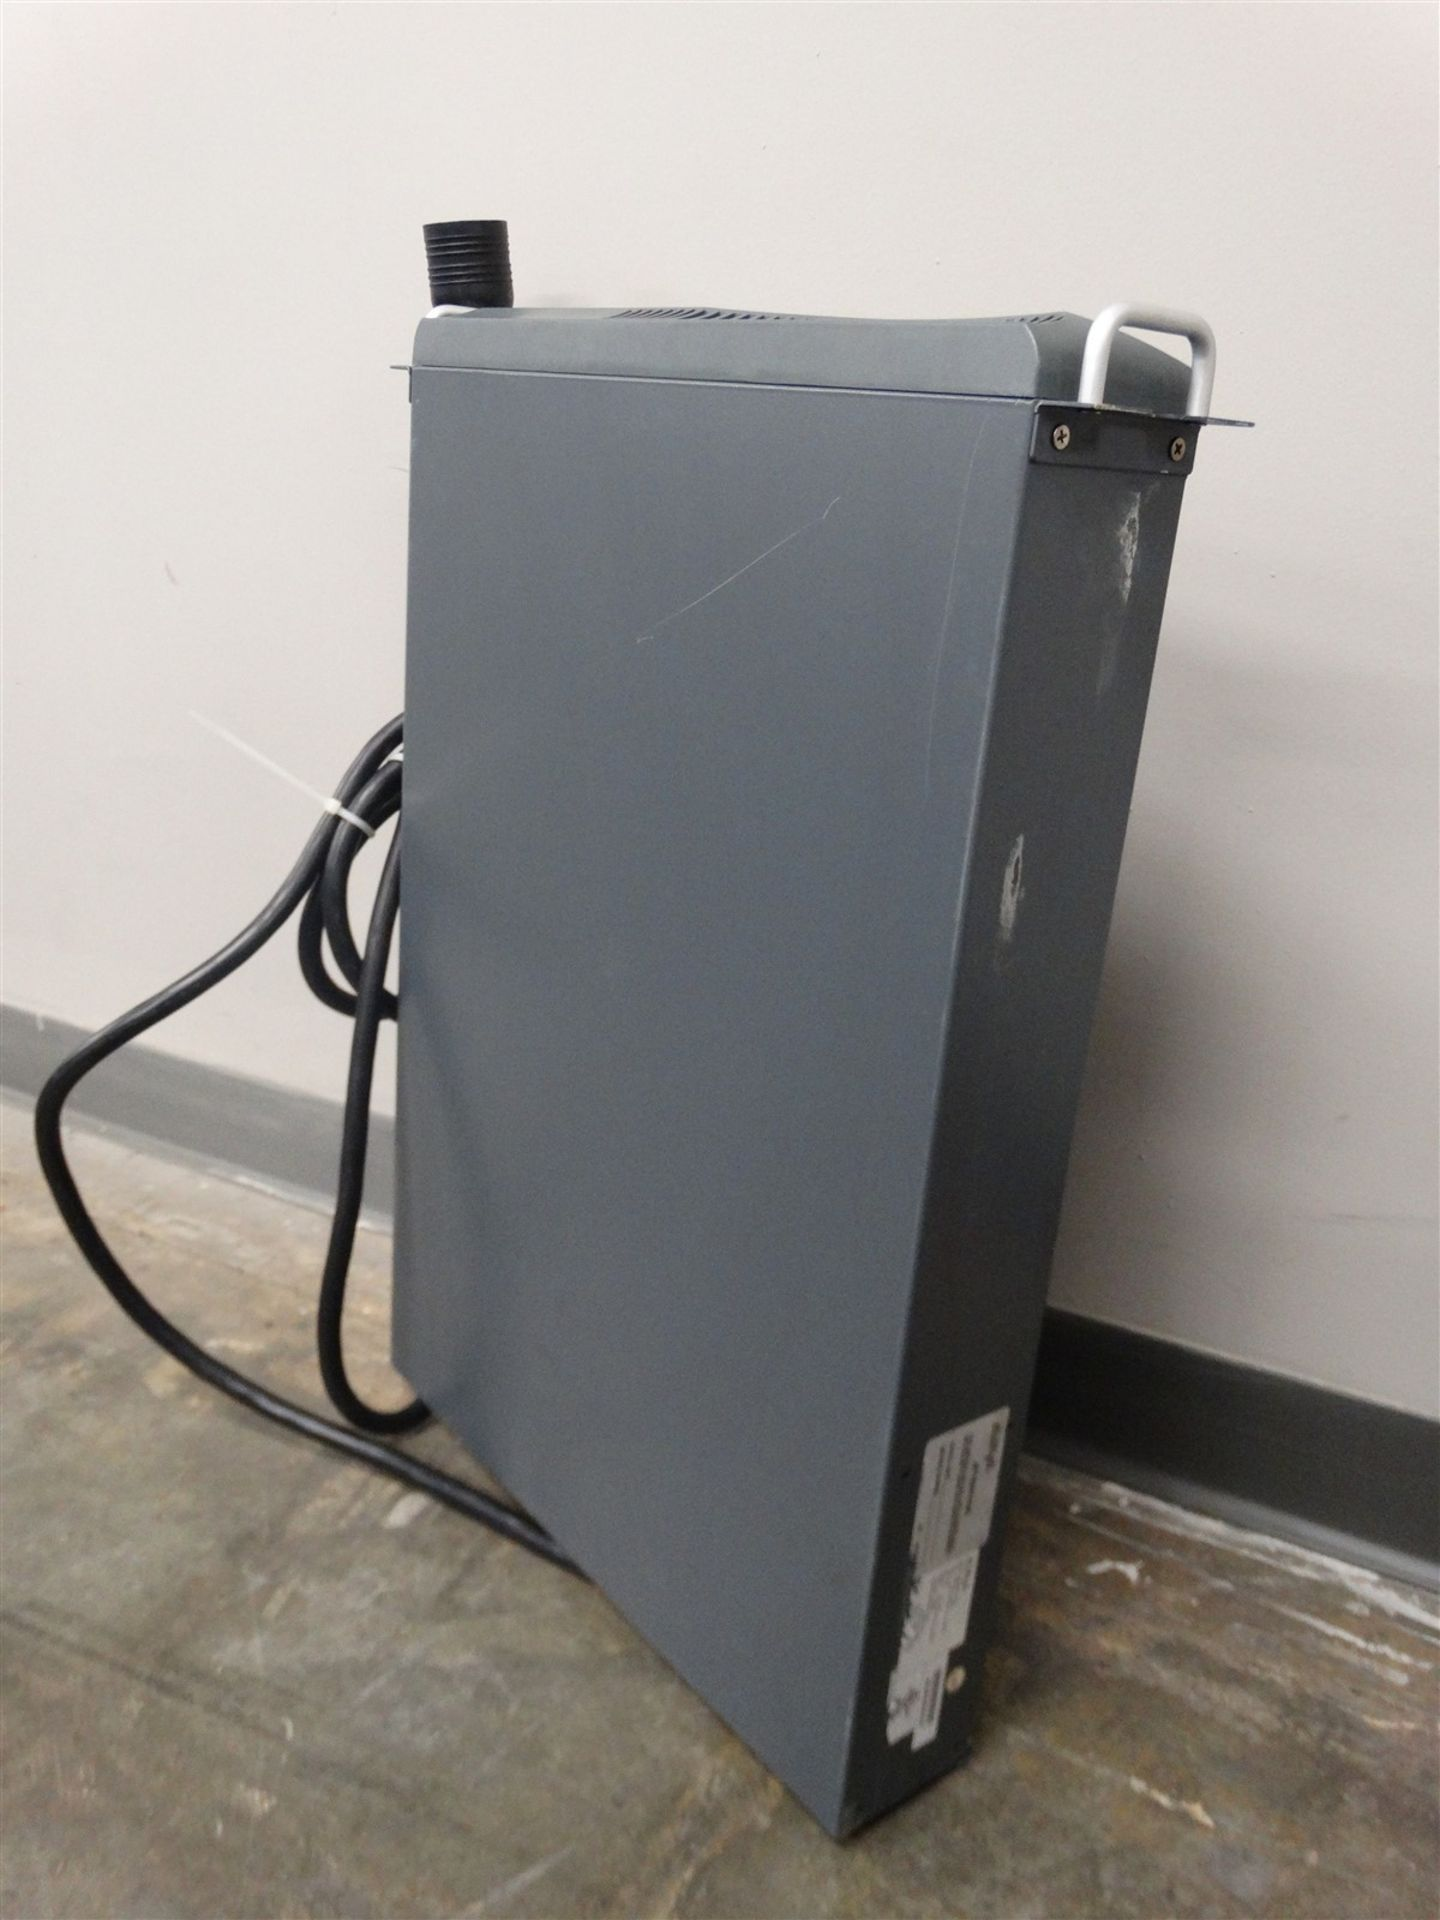 Lot 378 - Avaya Extended Battery Modules PW9125 3000U P/N 103002717-4191 W/ PW9125 72 EBME SKU: 20665